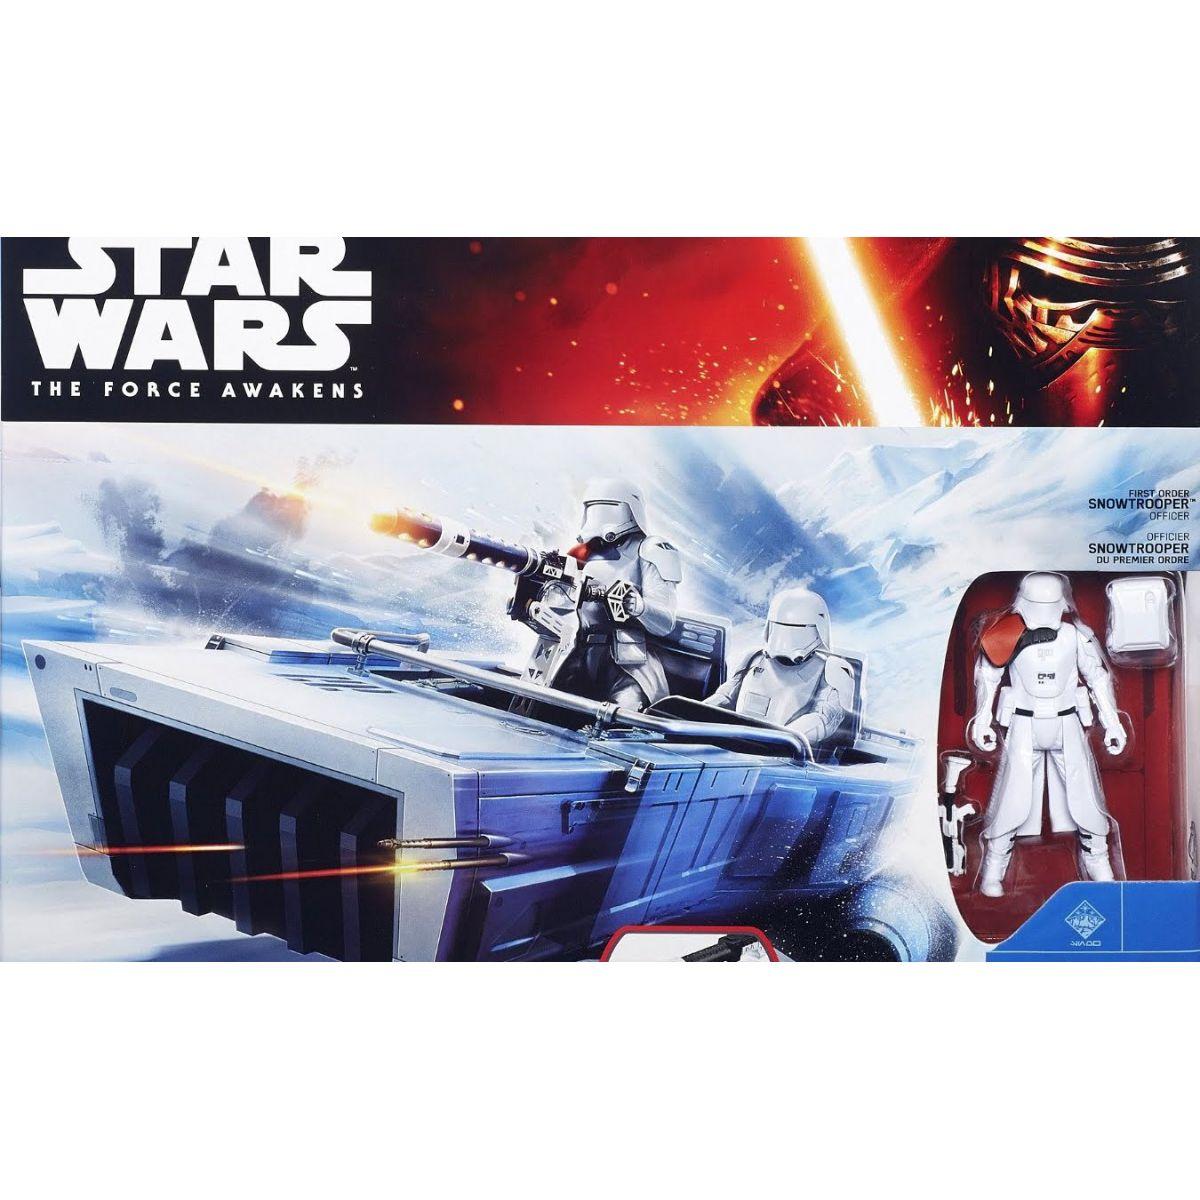 Star Wars The Force Awakens First order Snowspeeder - Hasbro